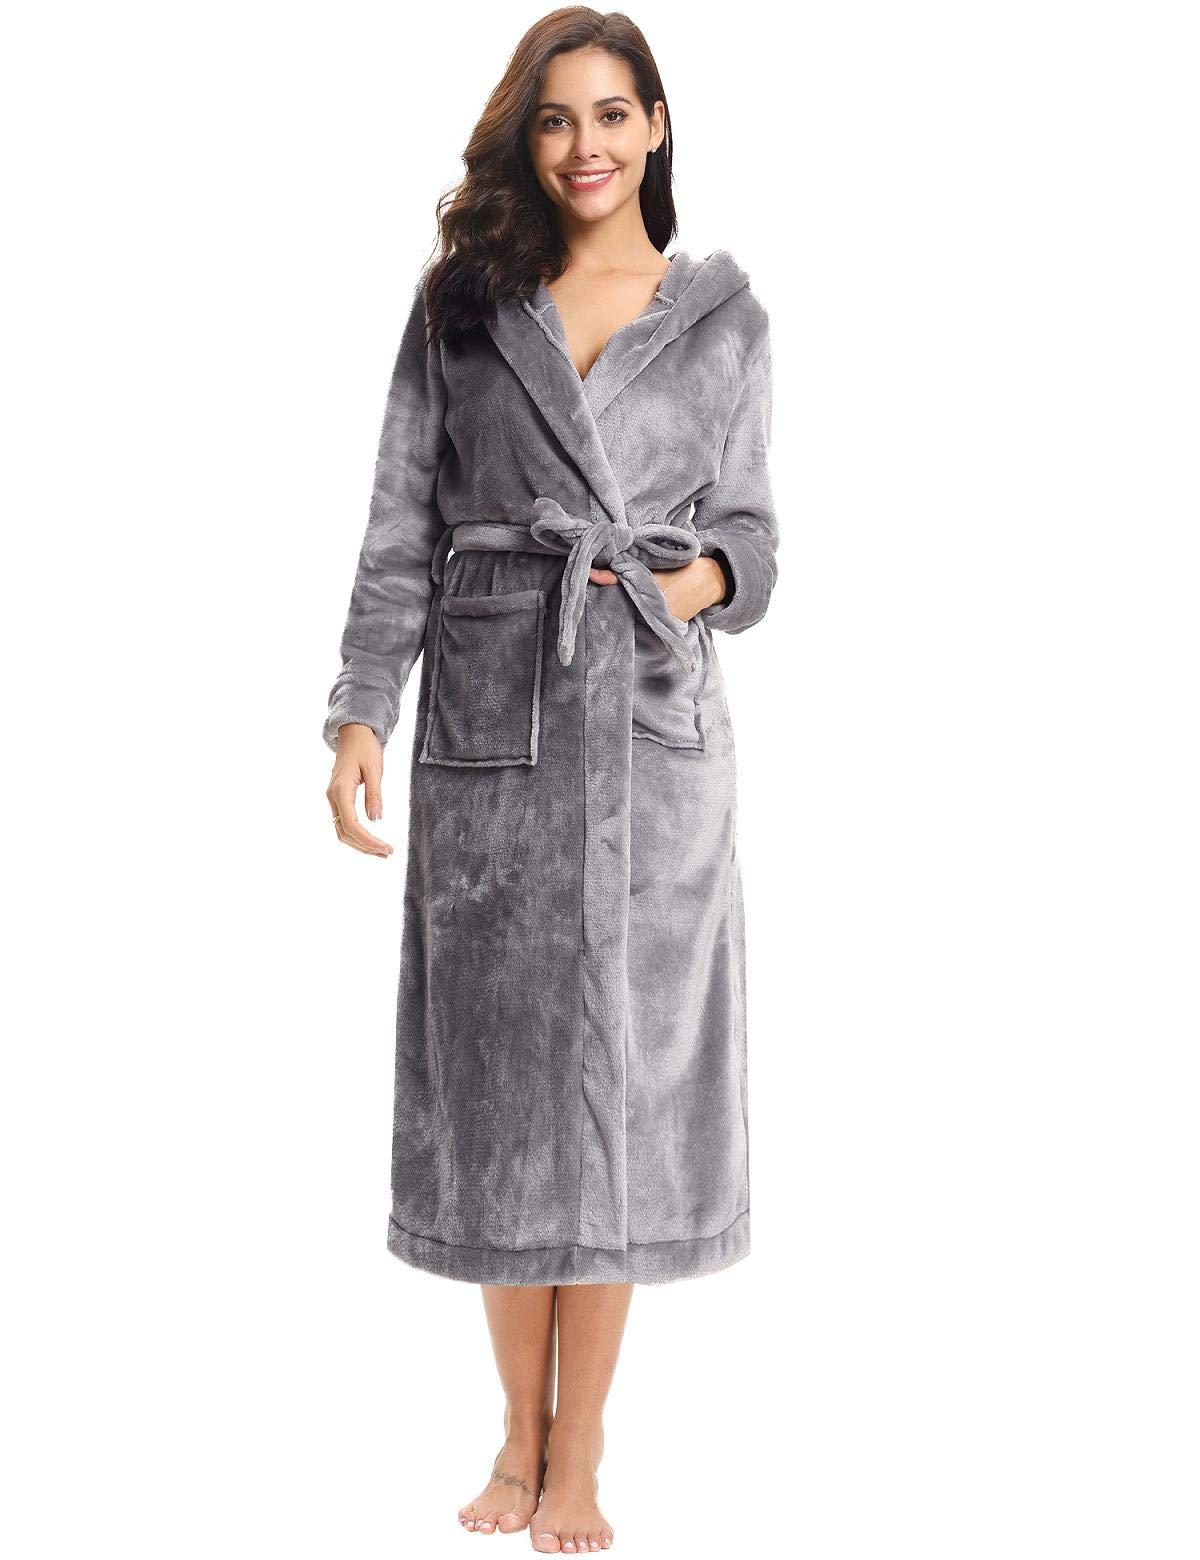 Abollria Women Kimono Robes Fleece Bathrobe Unisex Spa Robe Sleepwear